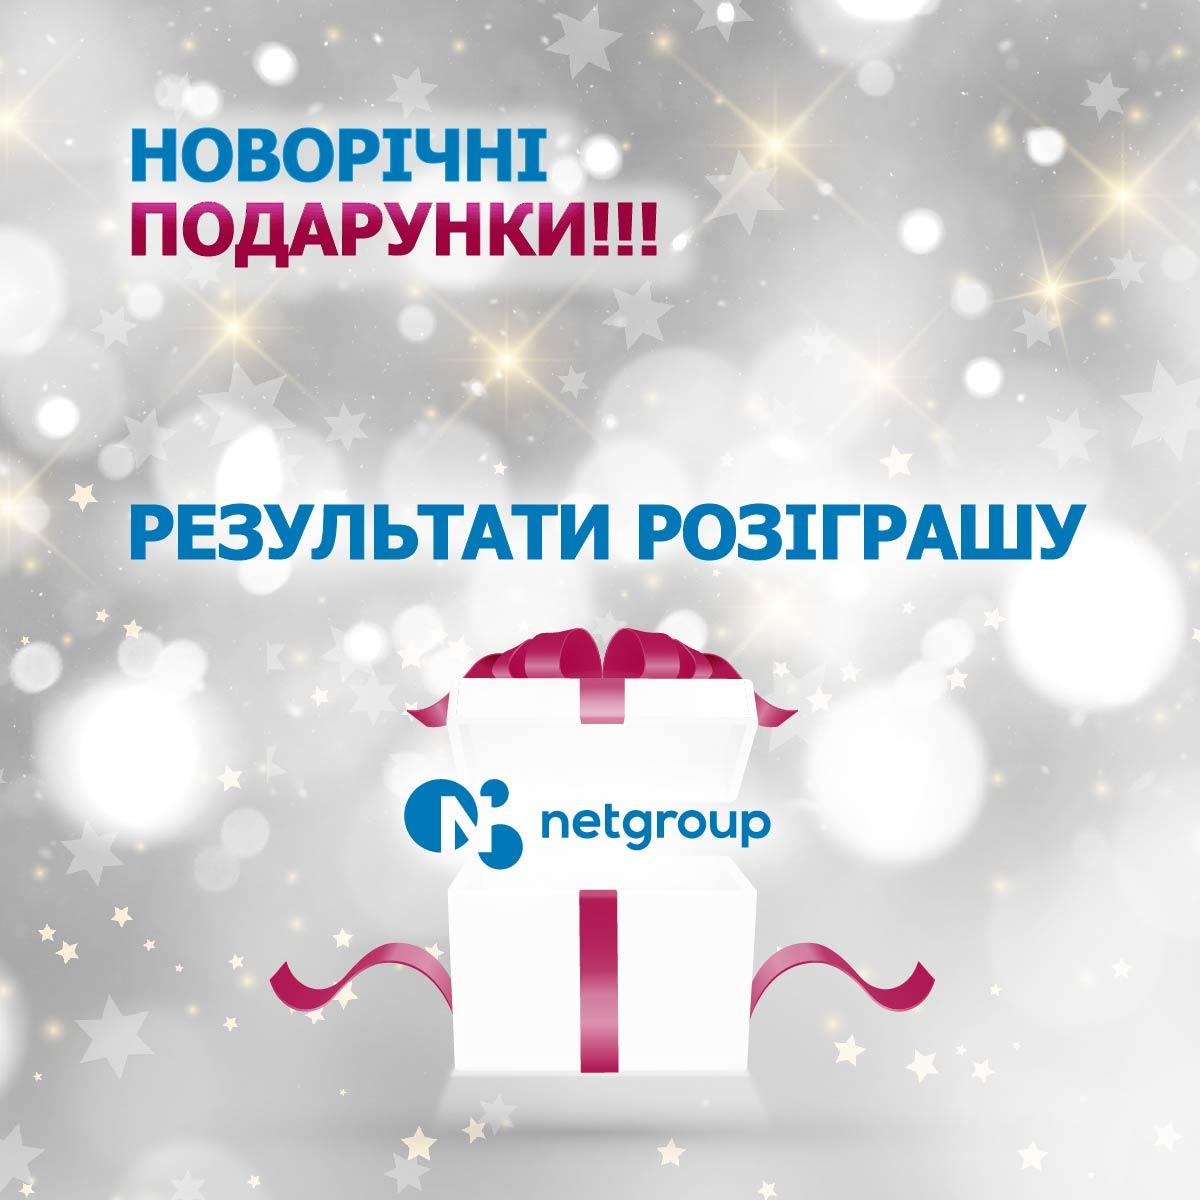 результати розірашу | giveaway | netgroup